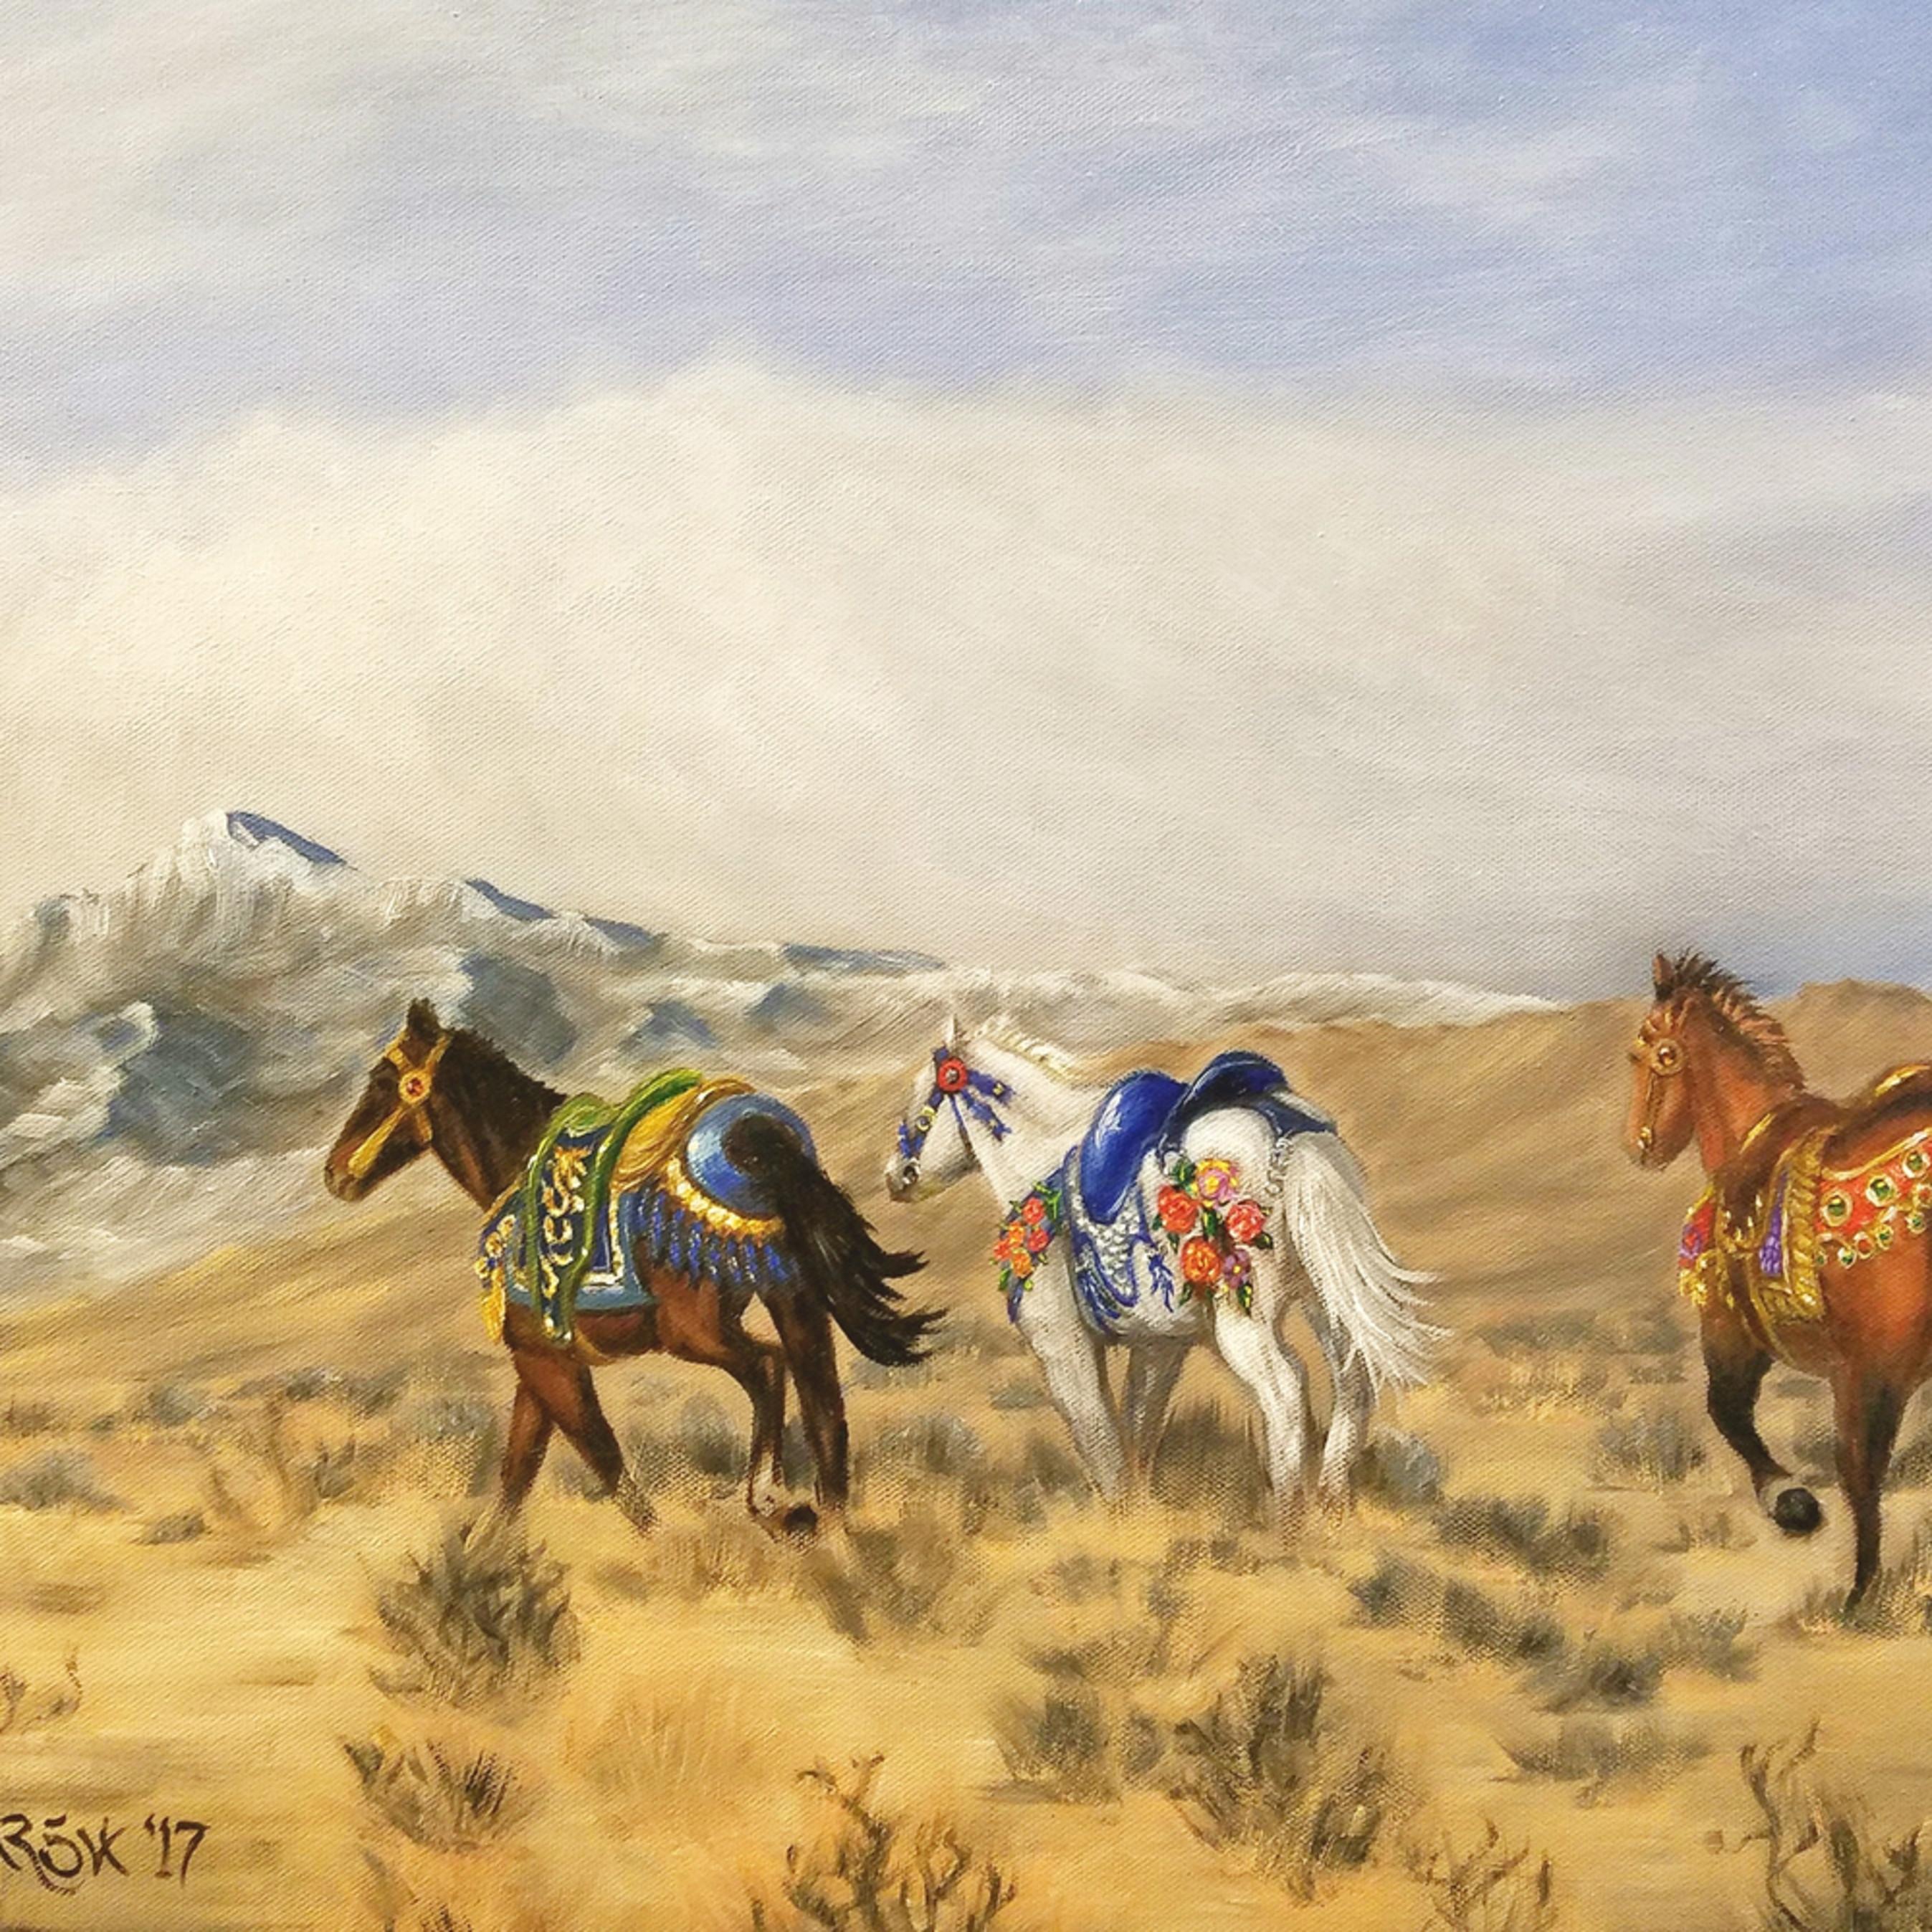 Wild carousel horses 087 nqjkuw